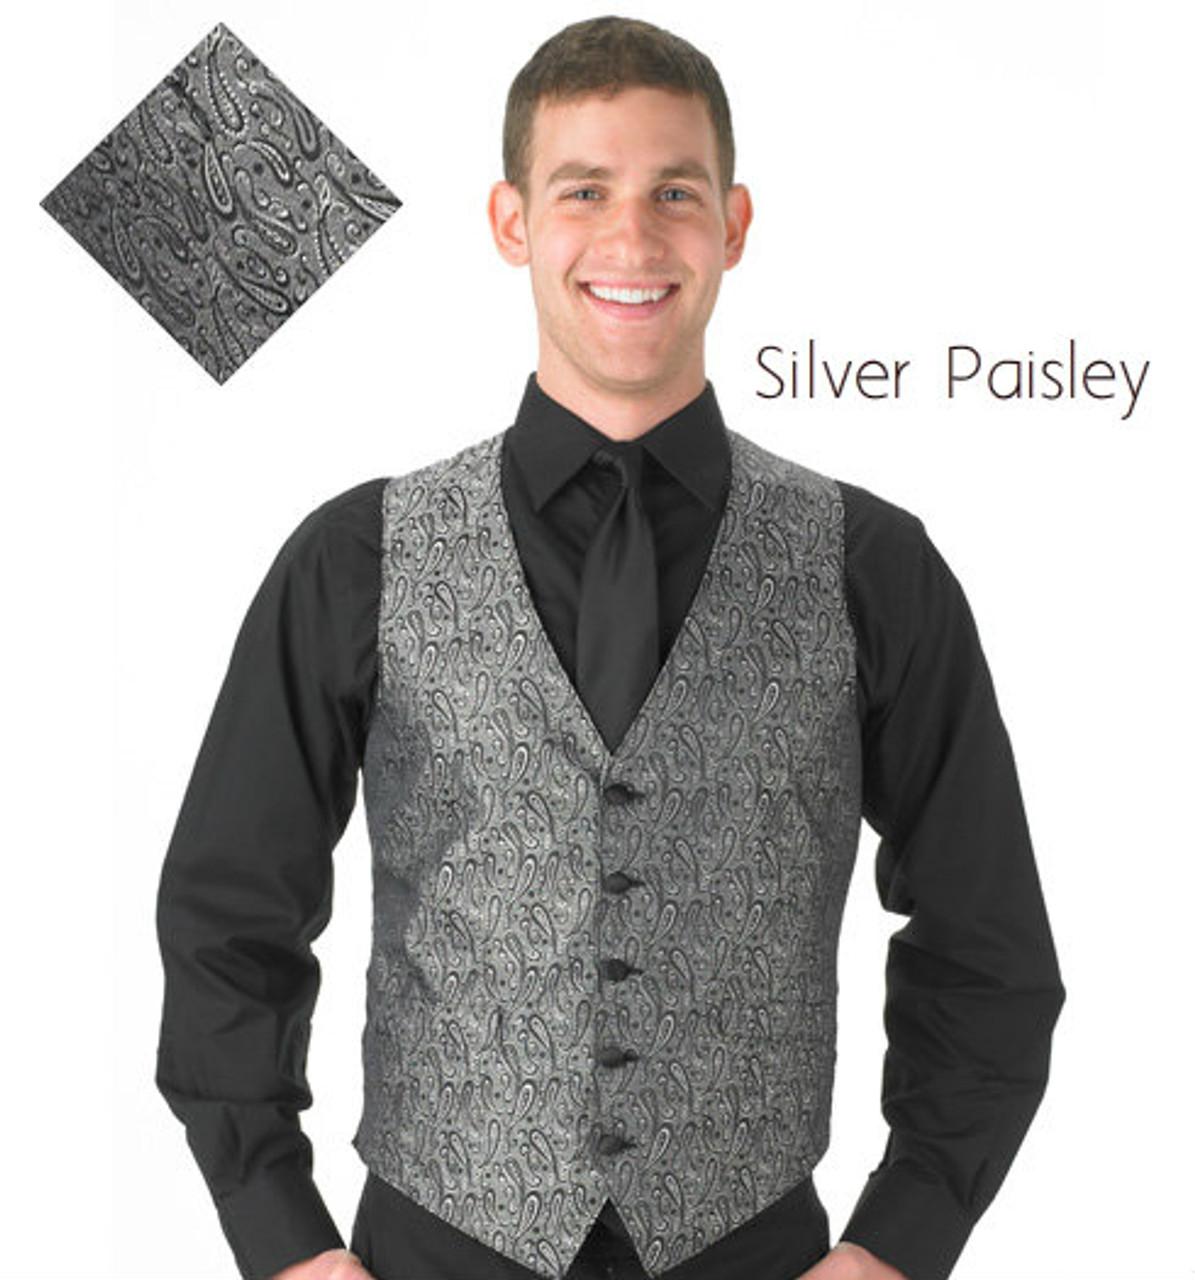 Silver Paisley